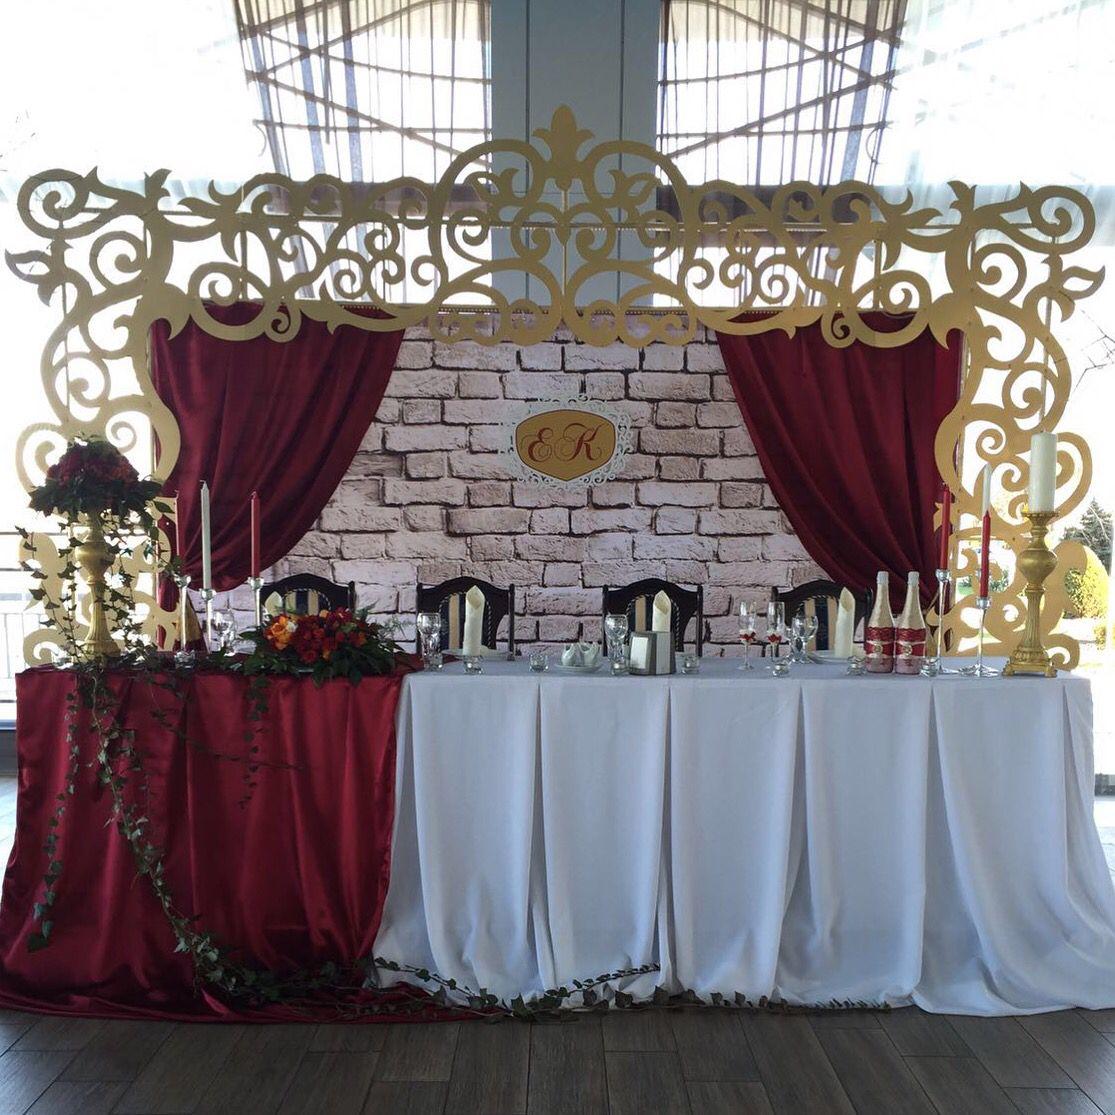 Maroon and white wedding decor  Свадьба марсала  Президиум молодых  Pinterest  Backdrops Wedding